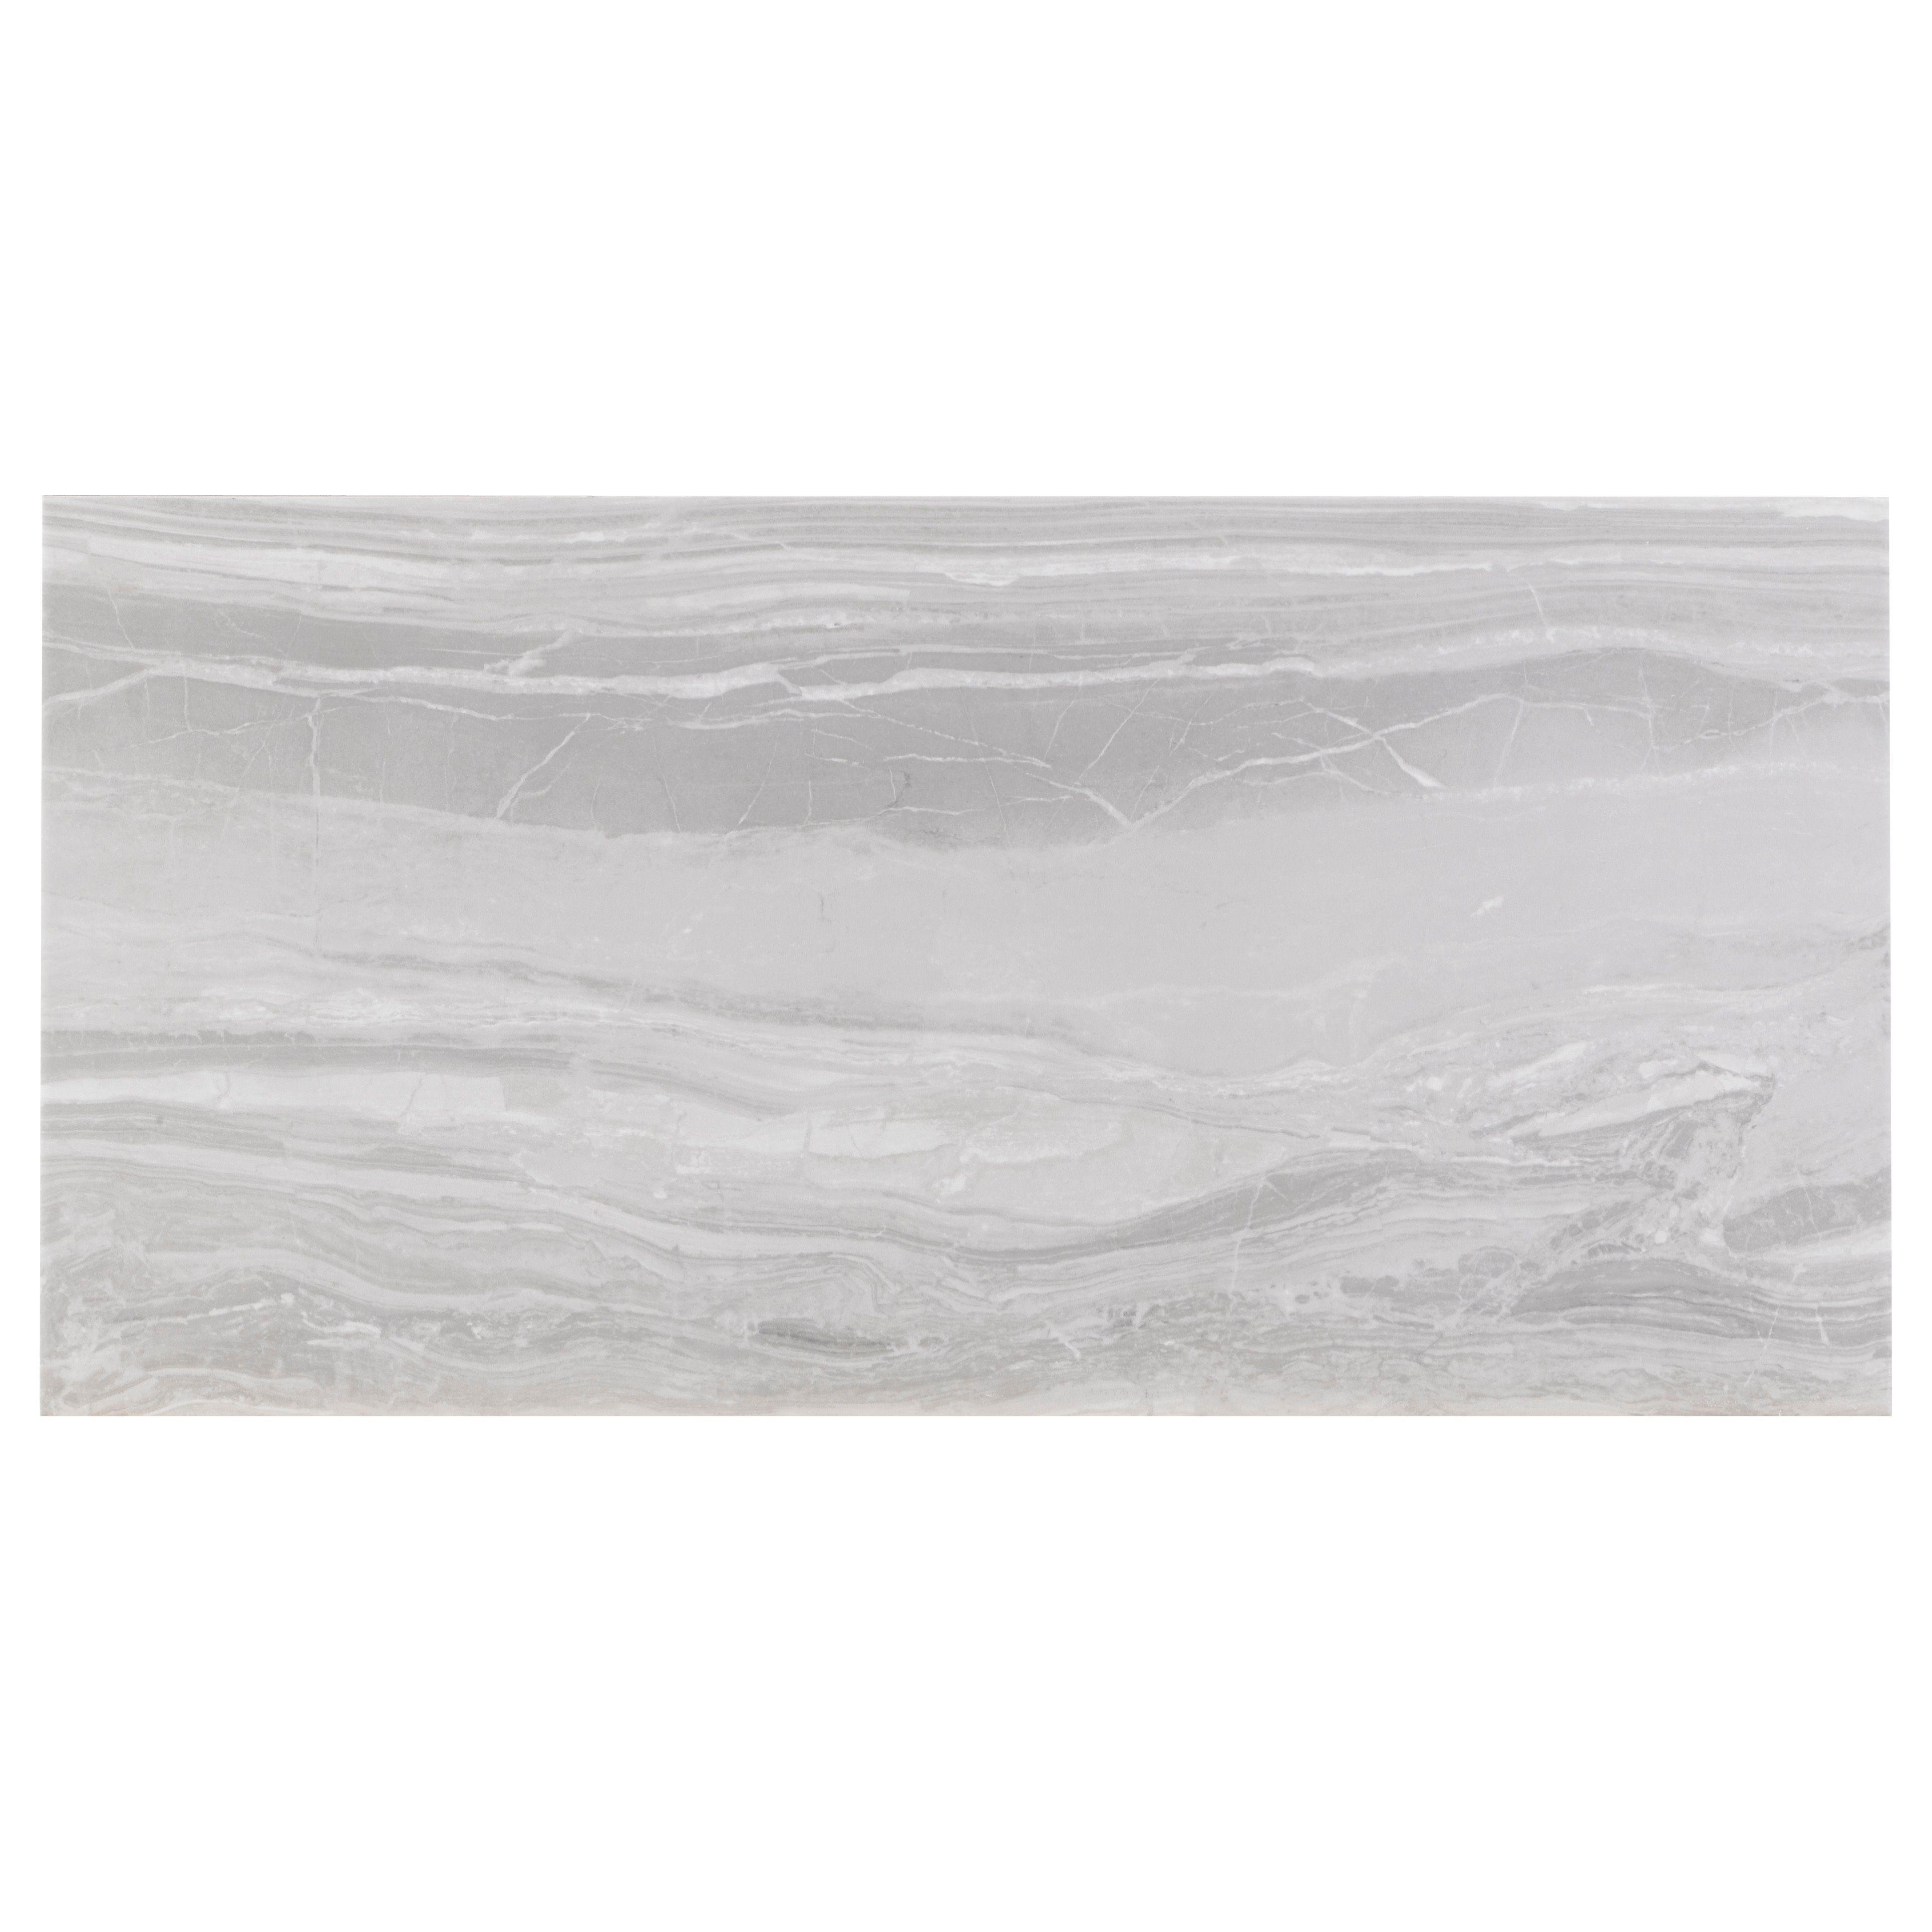 Bq Kitchen Floor Tiles Fossilised Wood Pebble Stone Effect Ceramic Wall Floor Tile